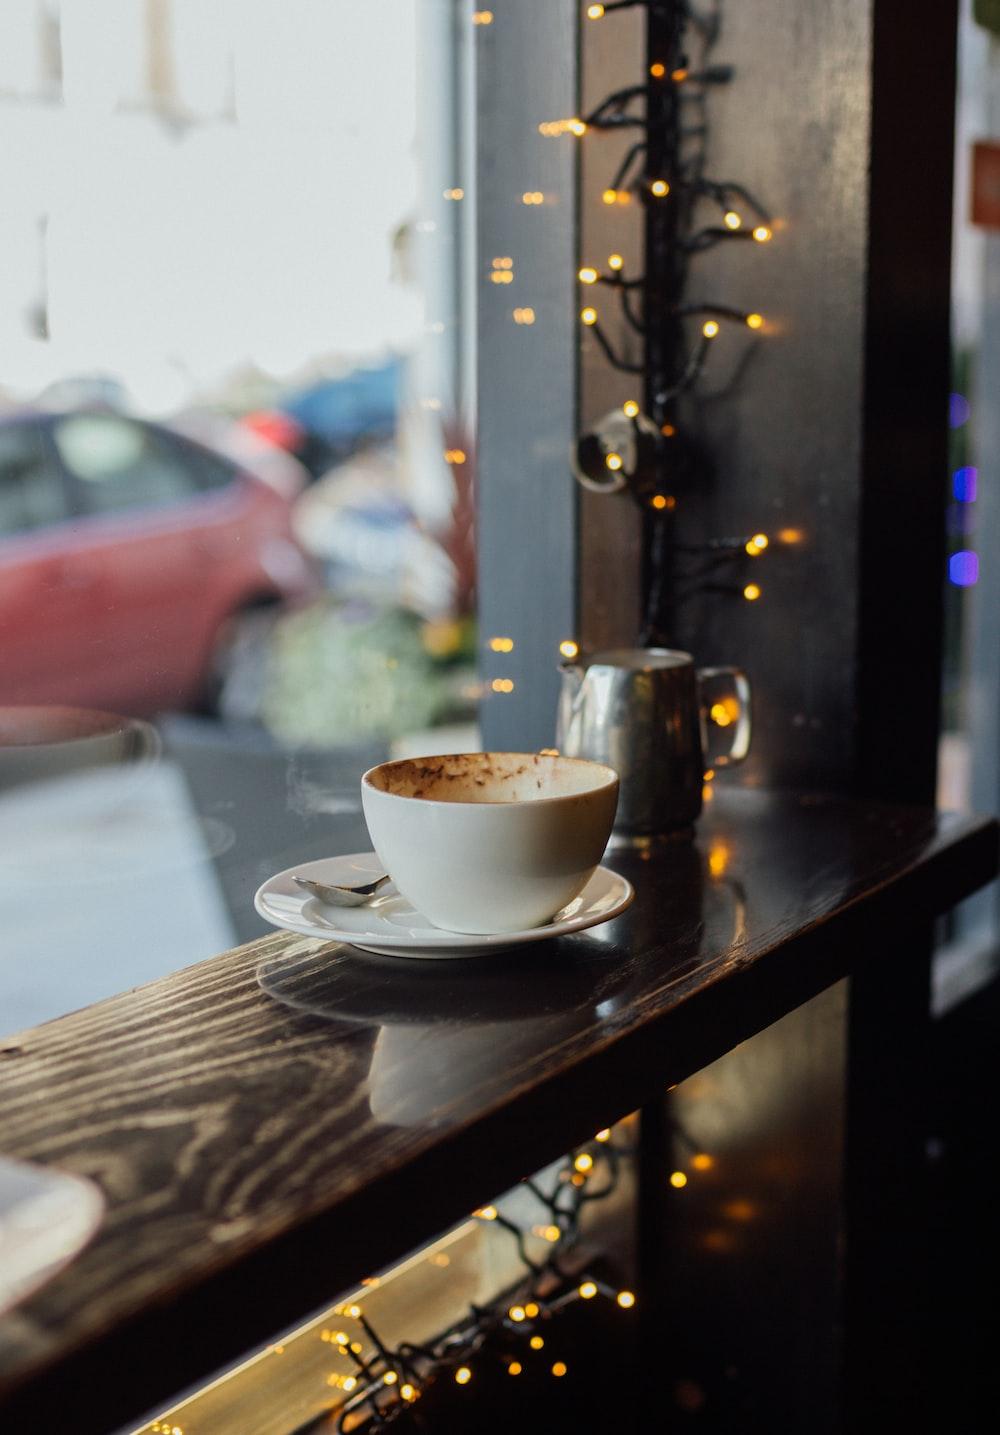 selective focus photography of coffee mug with saucer near window